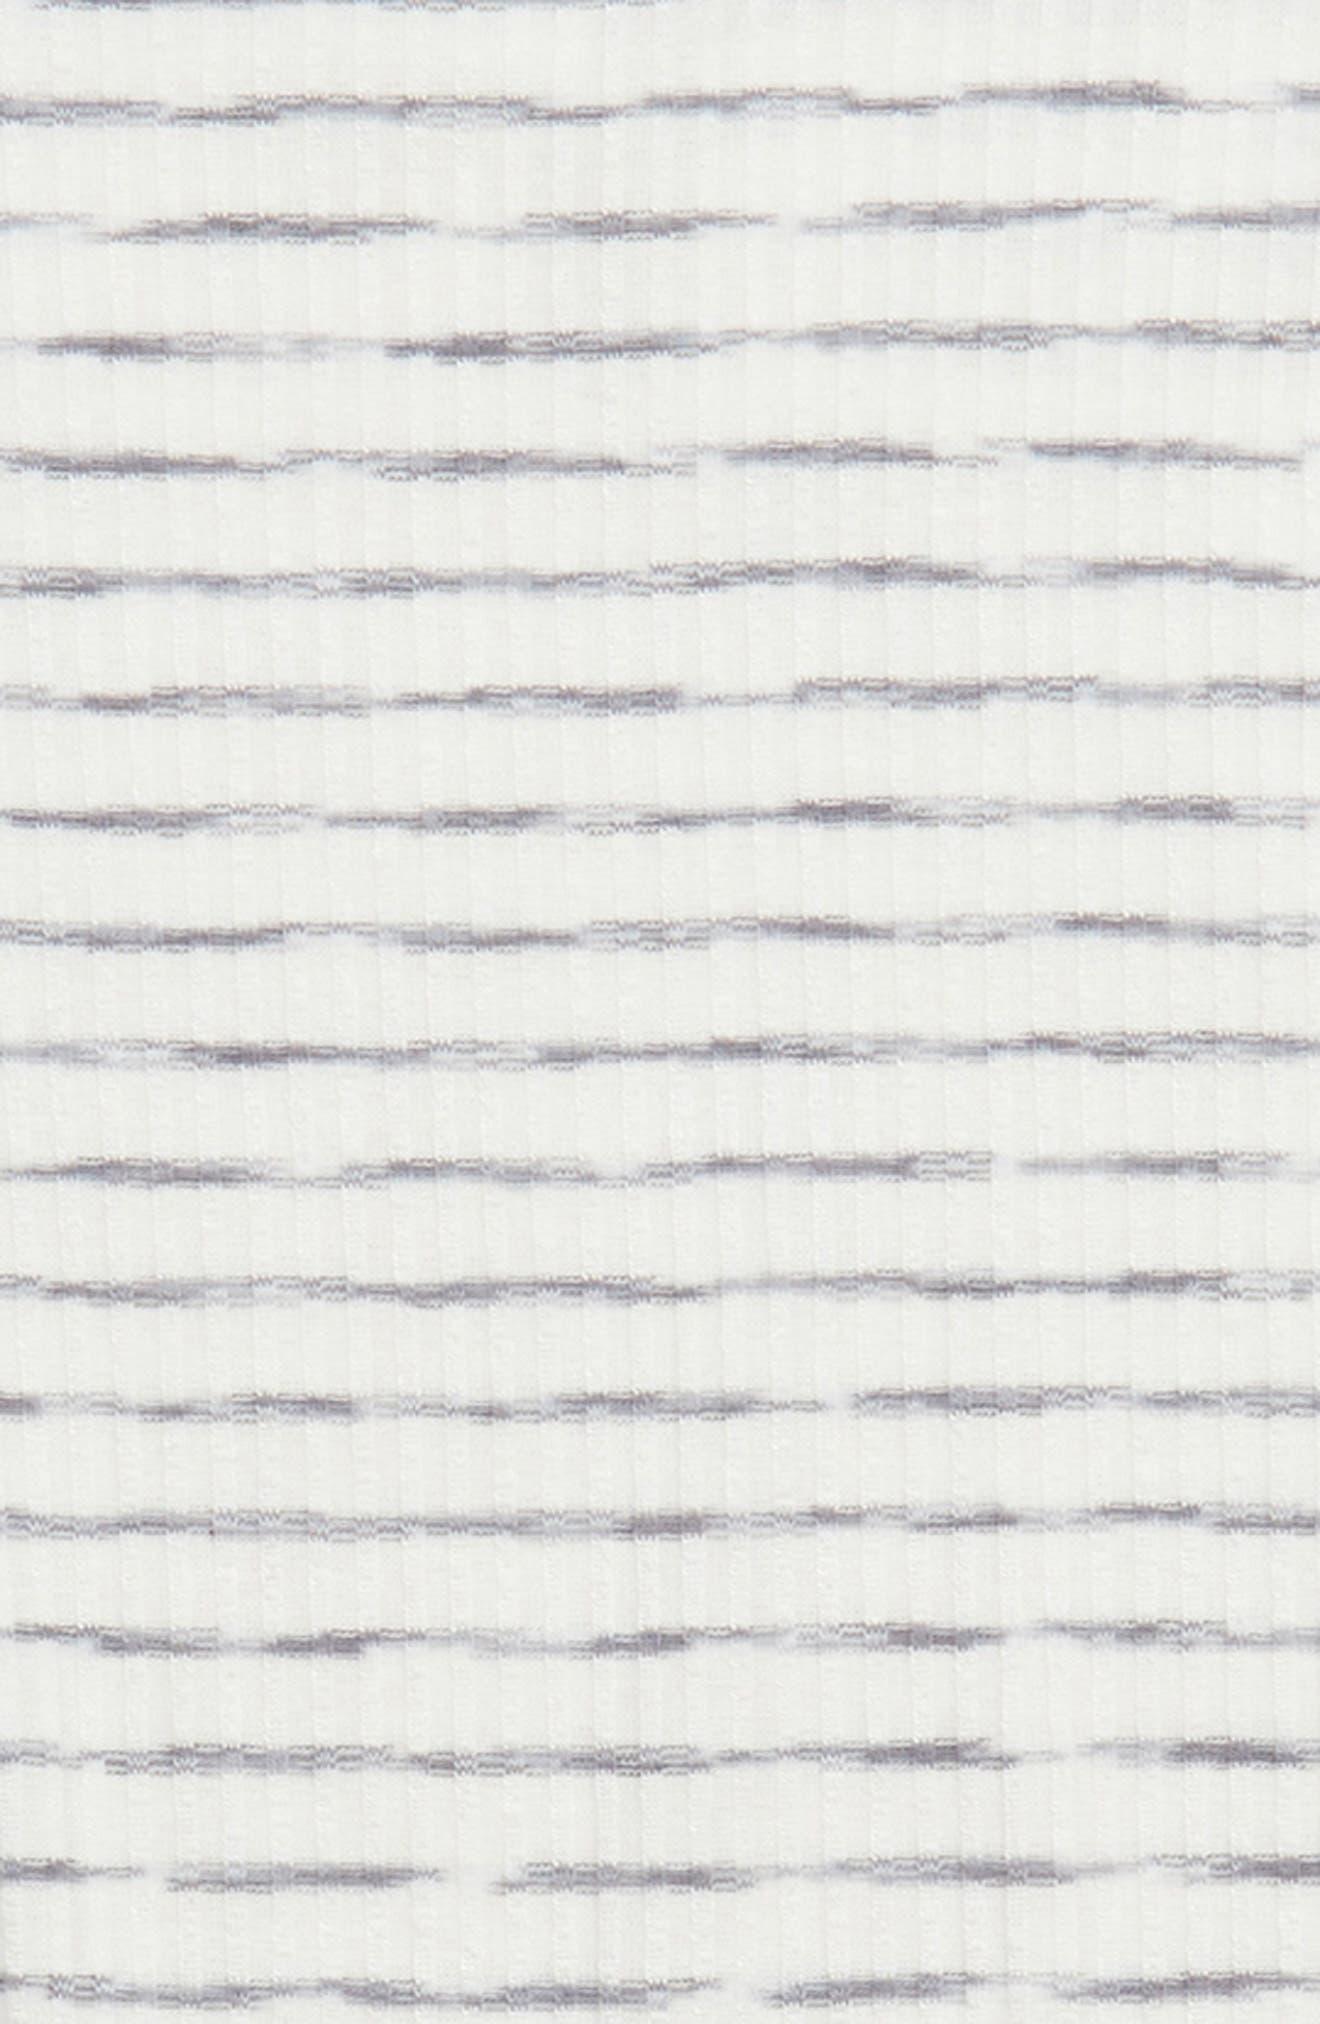 Rib Knit Tee,                             Alternate thumbnail 3, color,                             Grey/ White